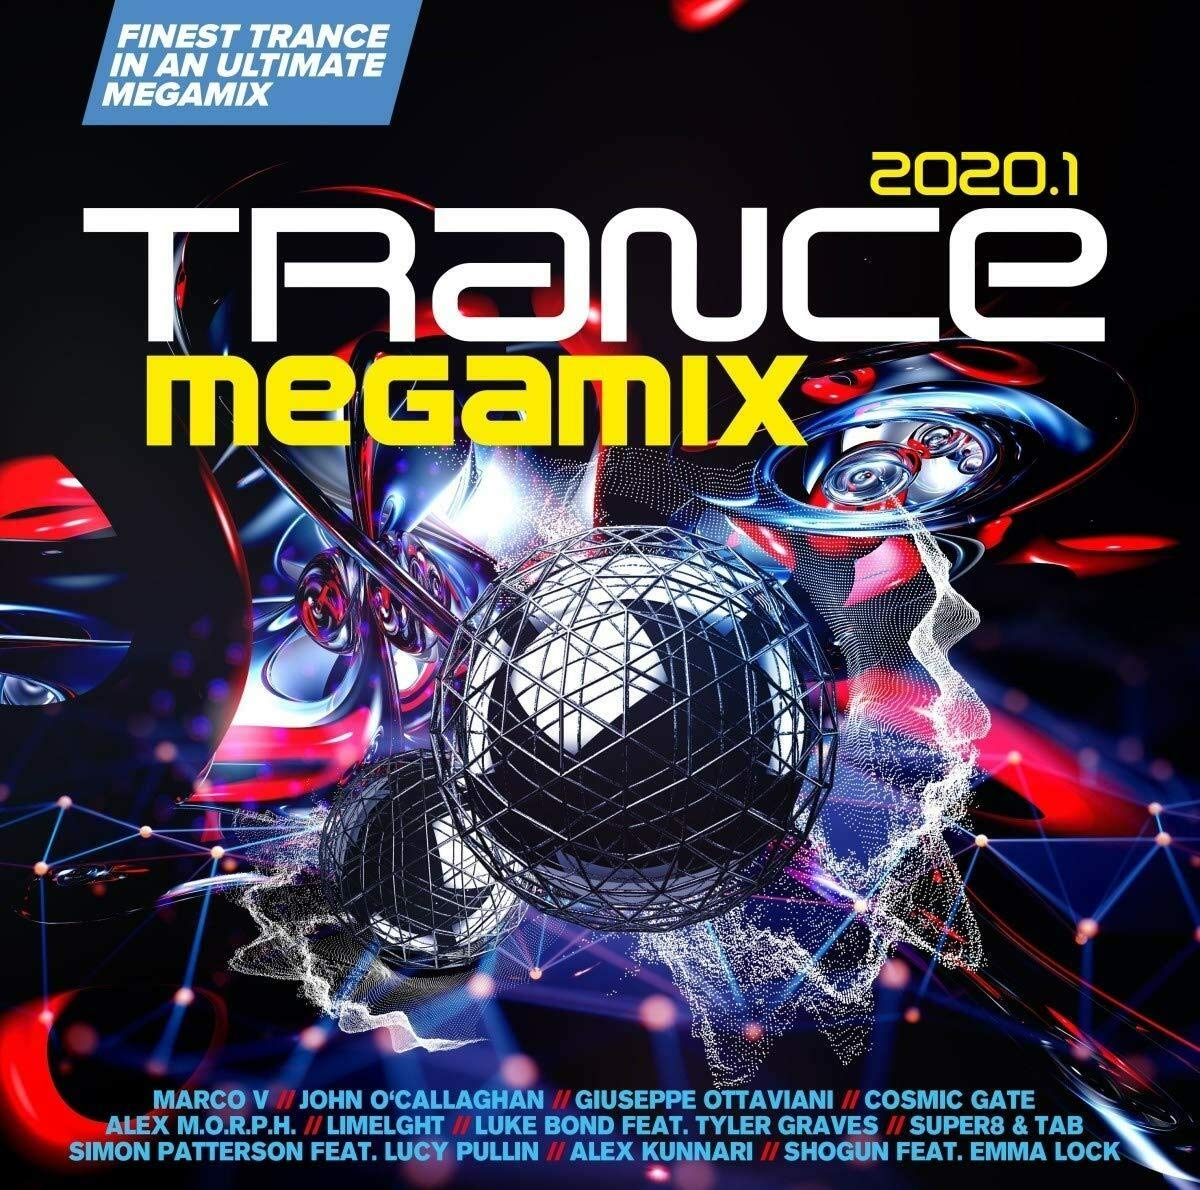 Trance Megamix 2020.1